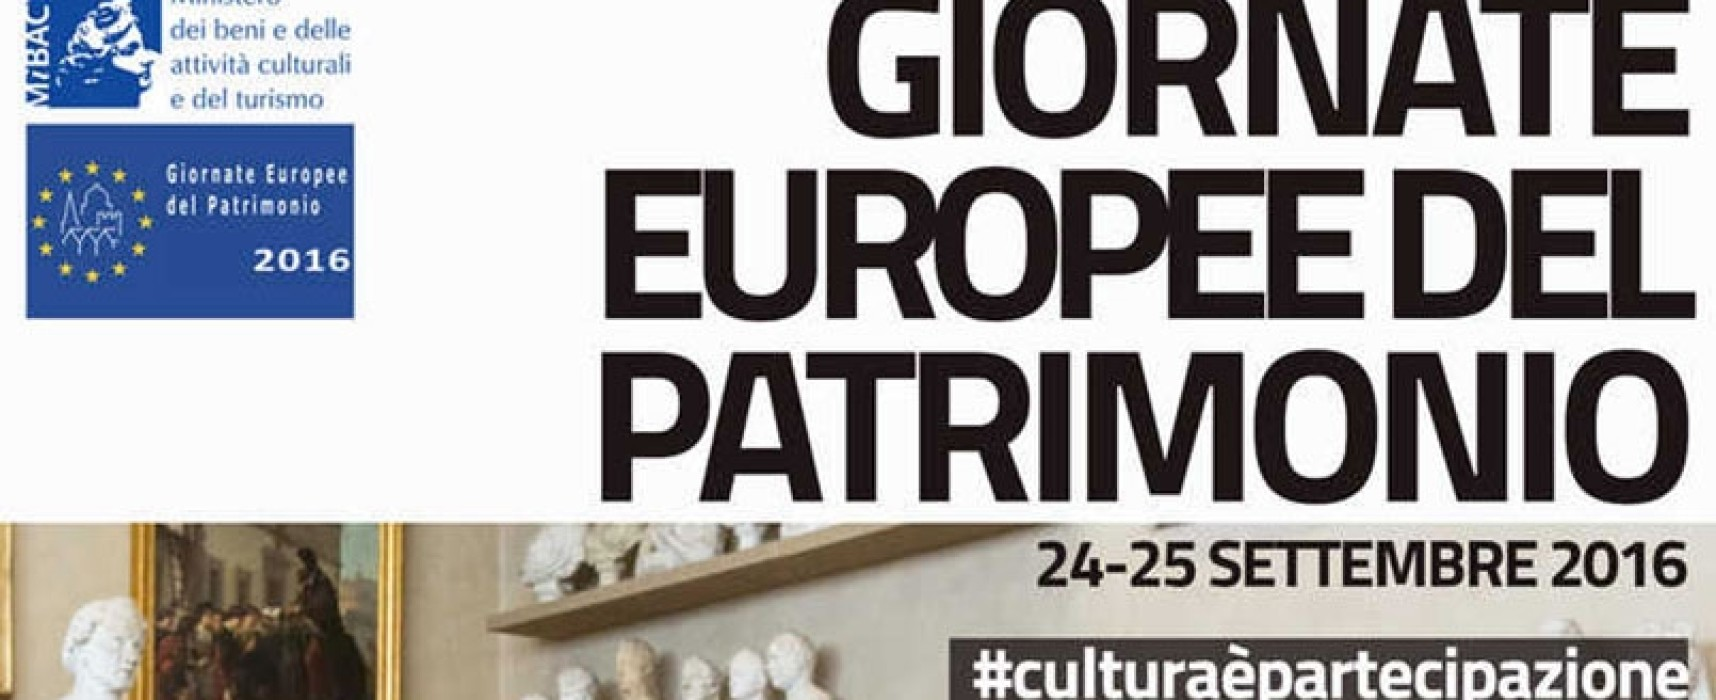 Giornate Europee del Patrimonio #GEP2016